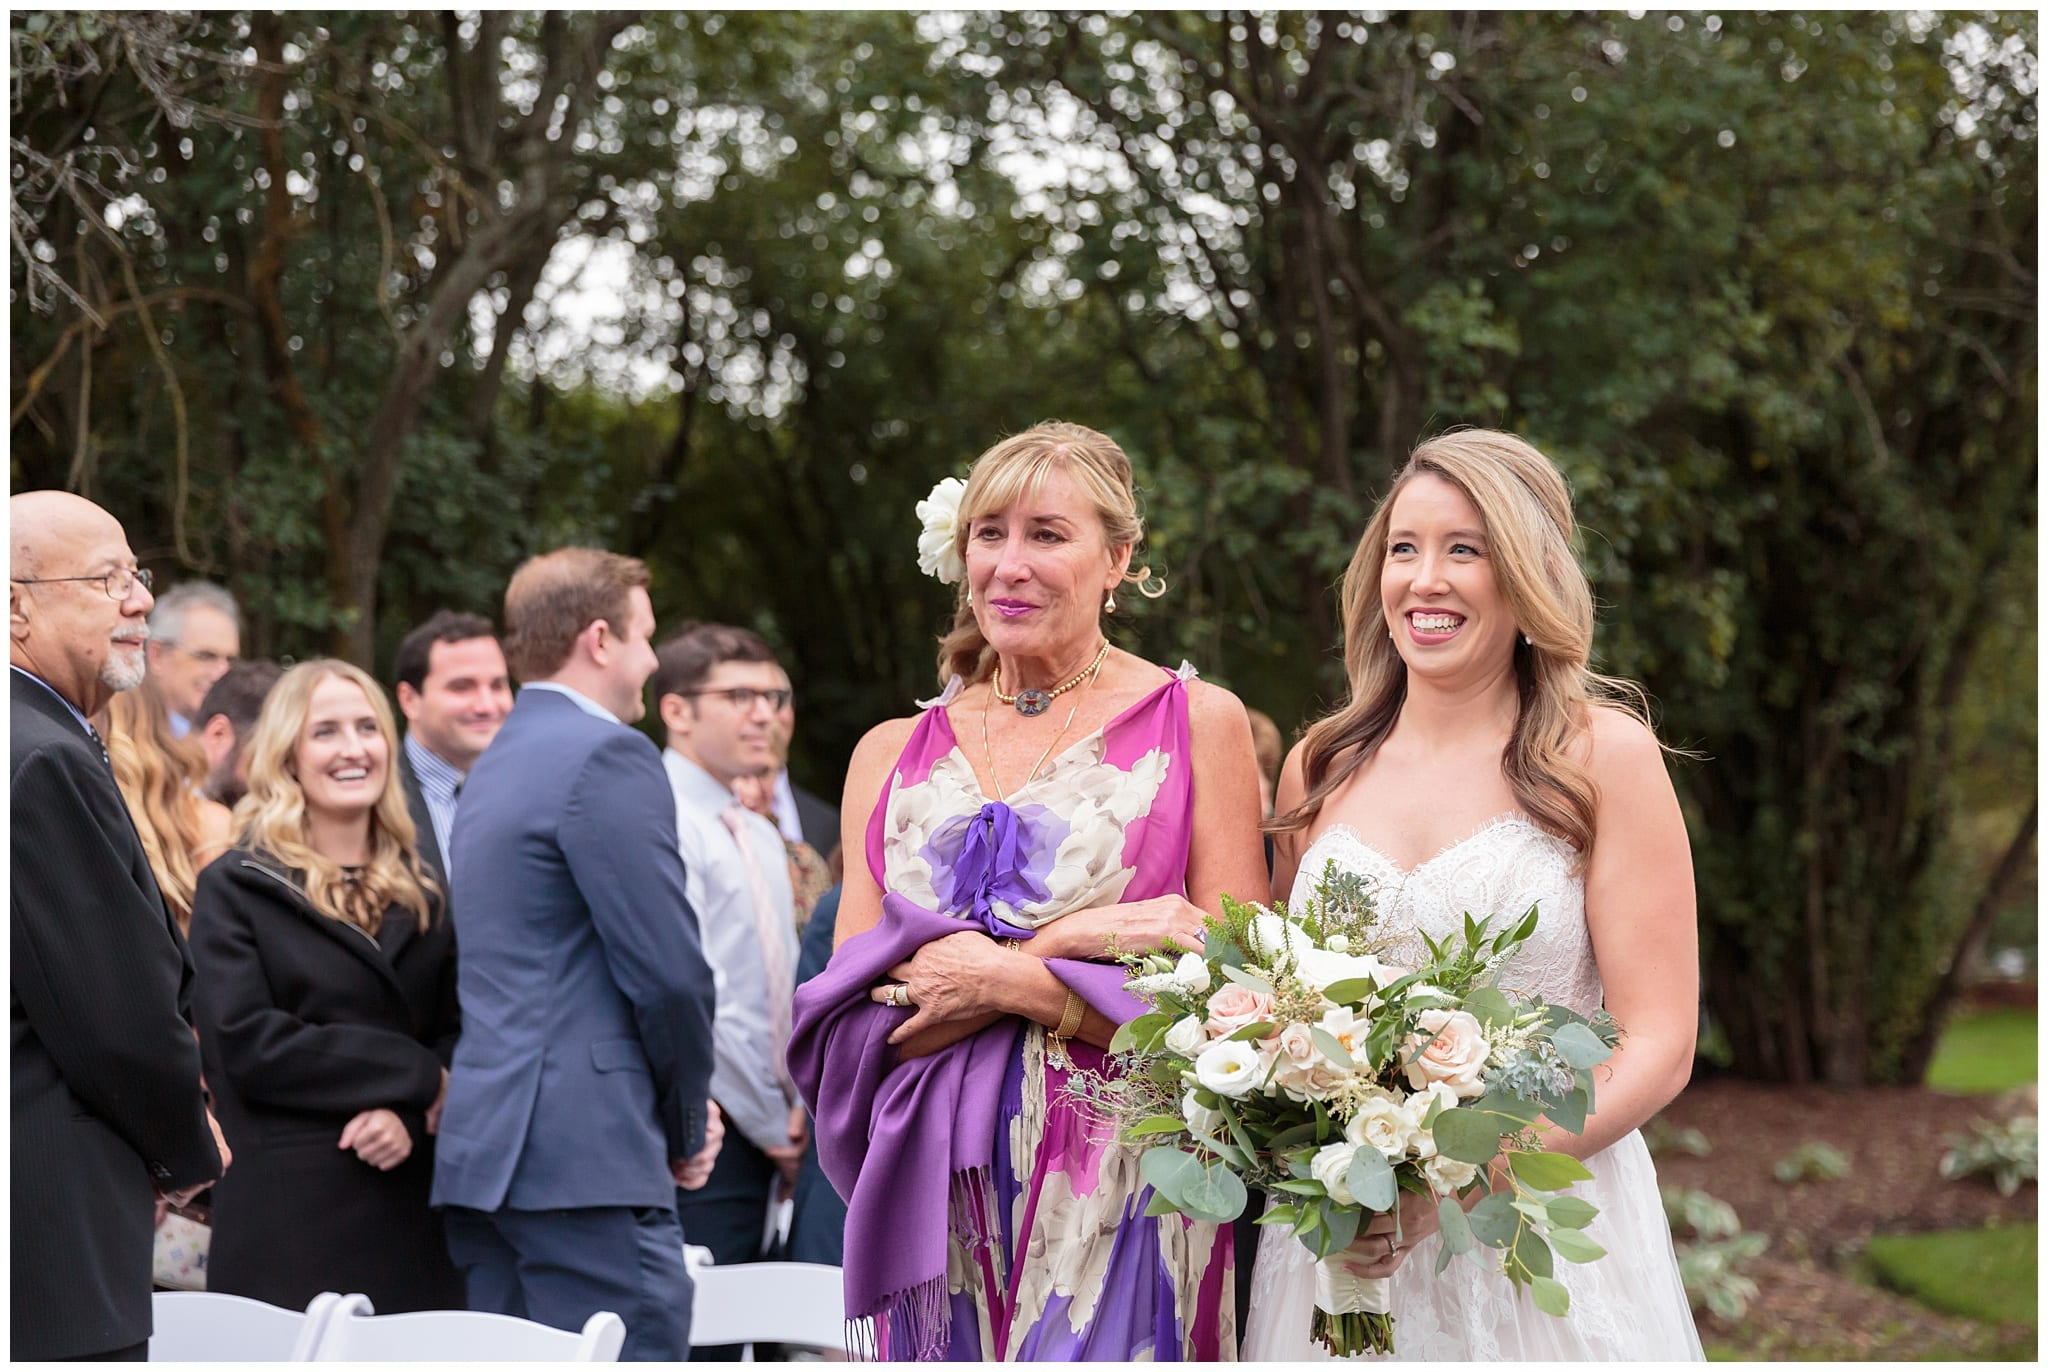 Oak Brook Bath and Tennis Club Outdoor Ceremony